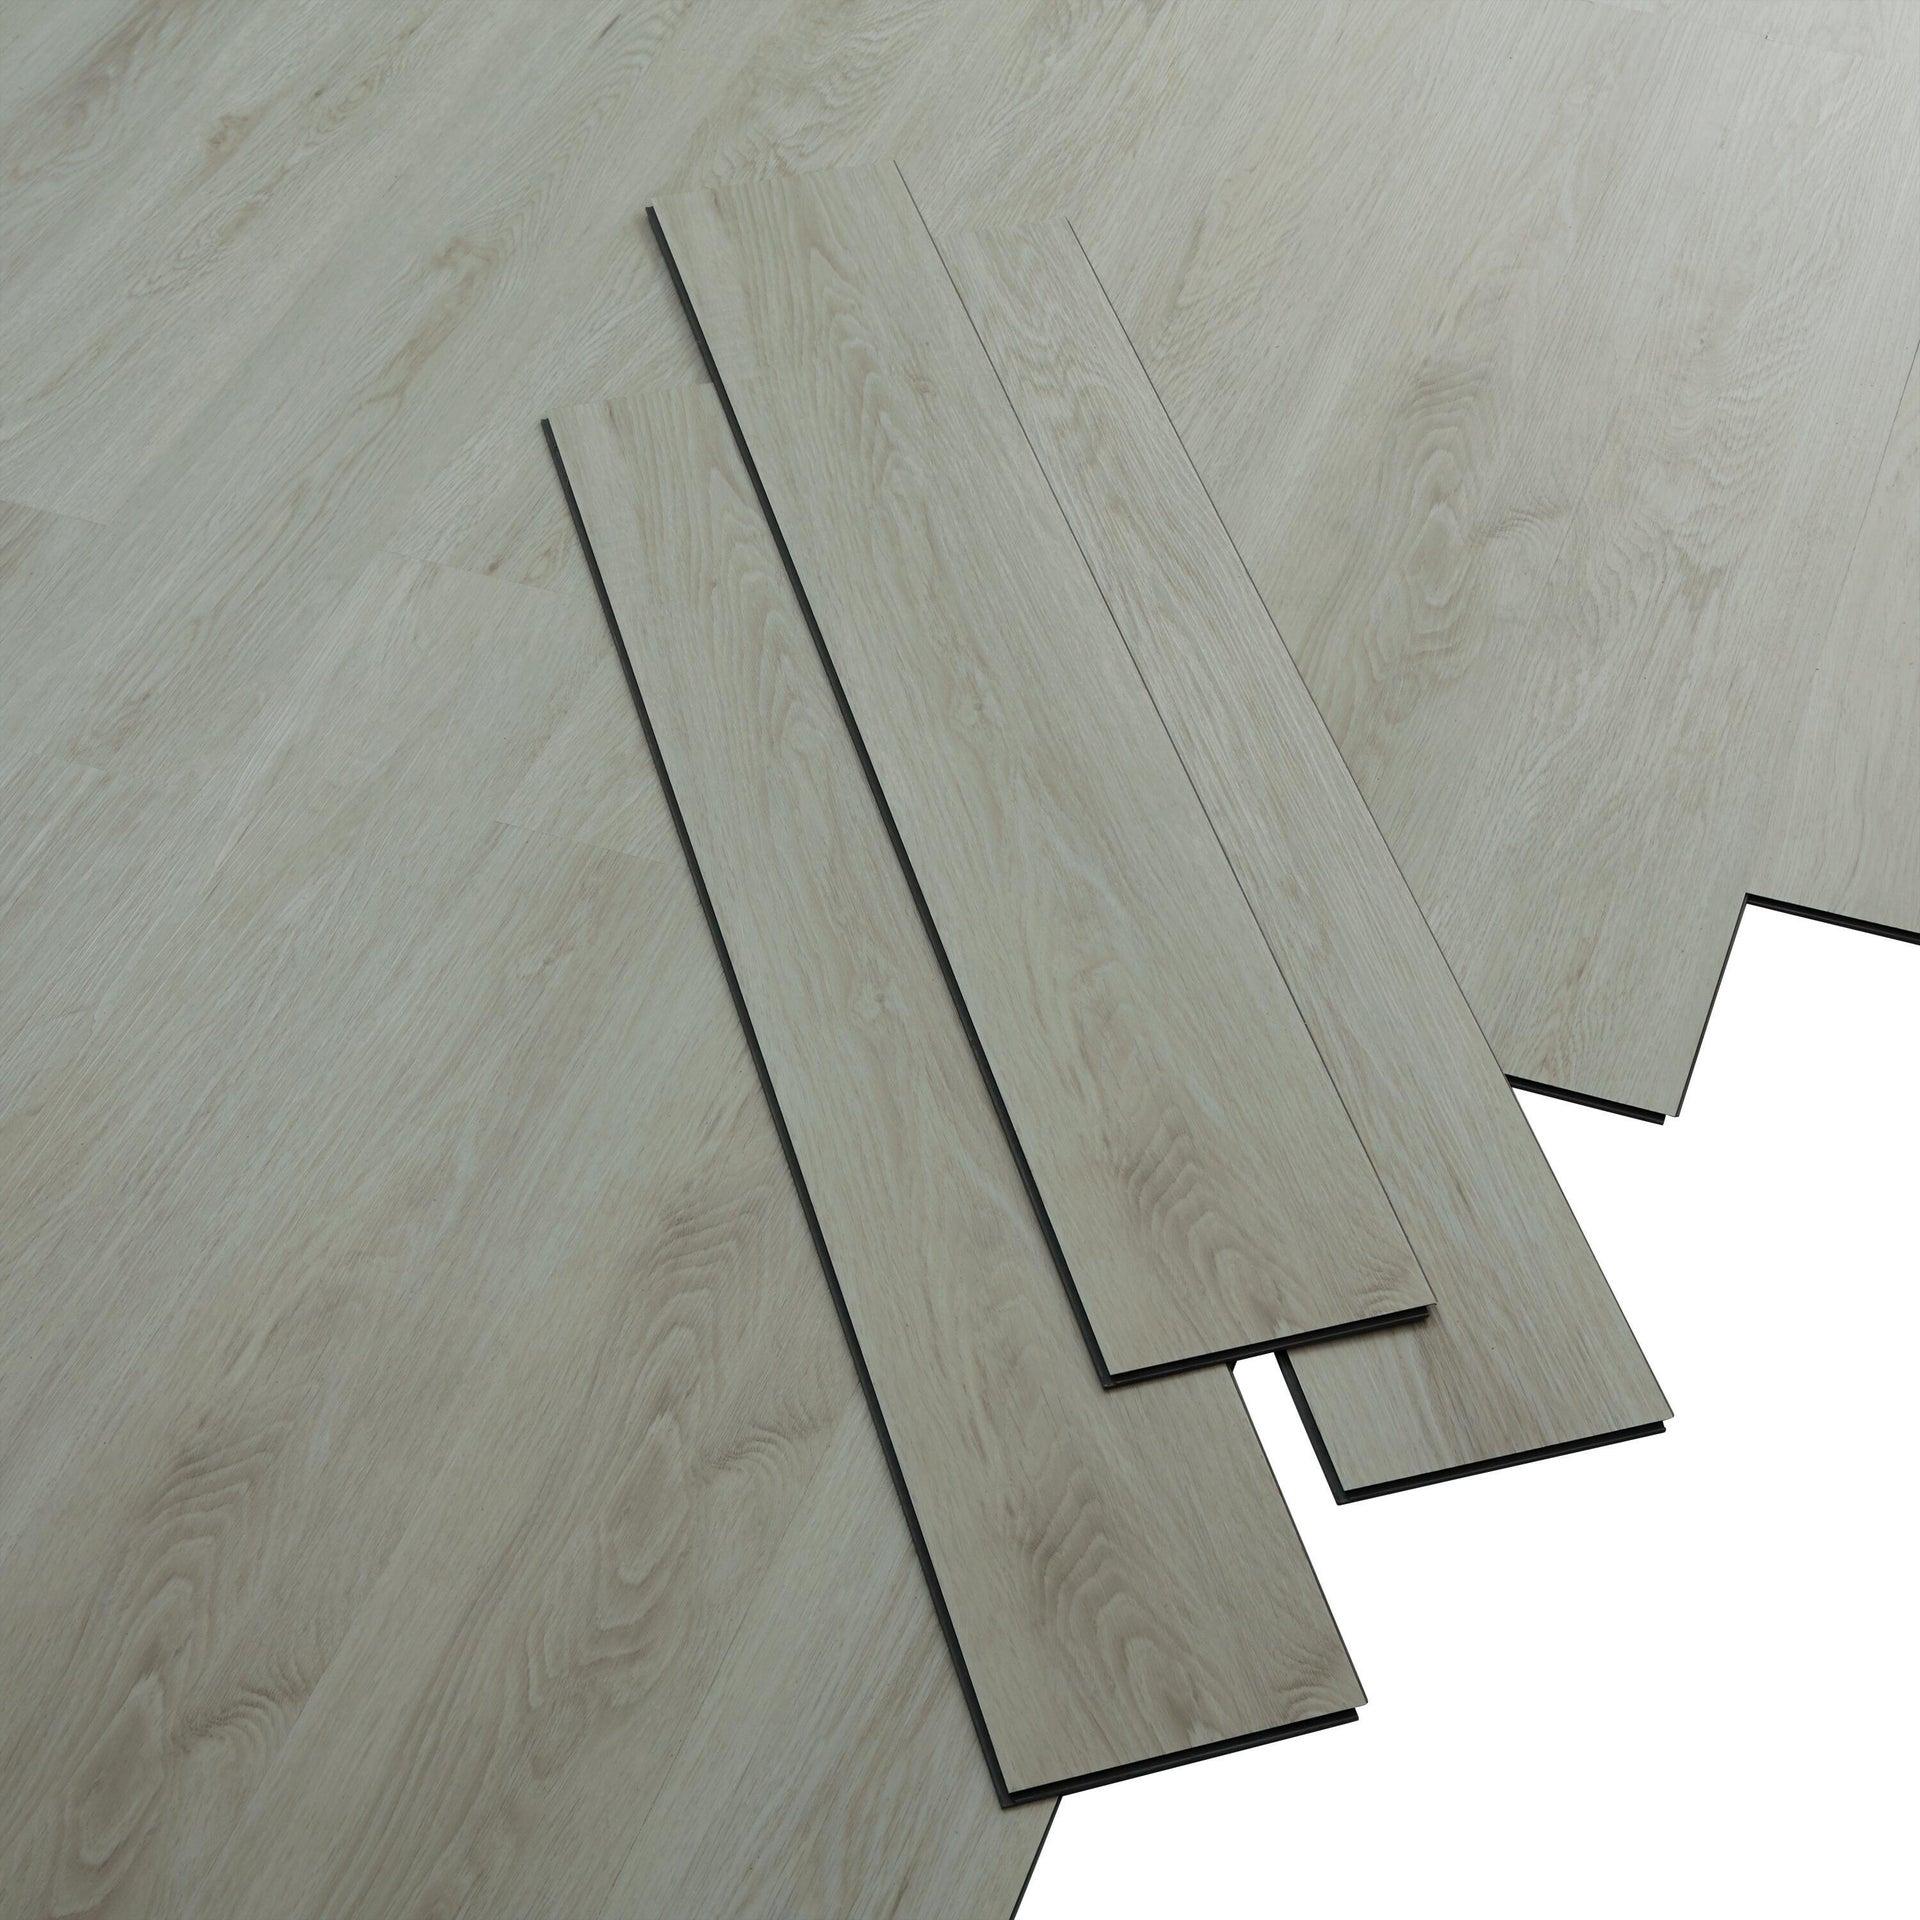 Pavimento PVC flottante clic+ Trend white Sp 4 mm bianco - 3